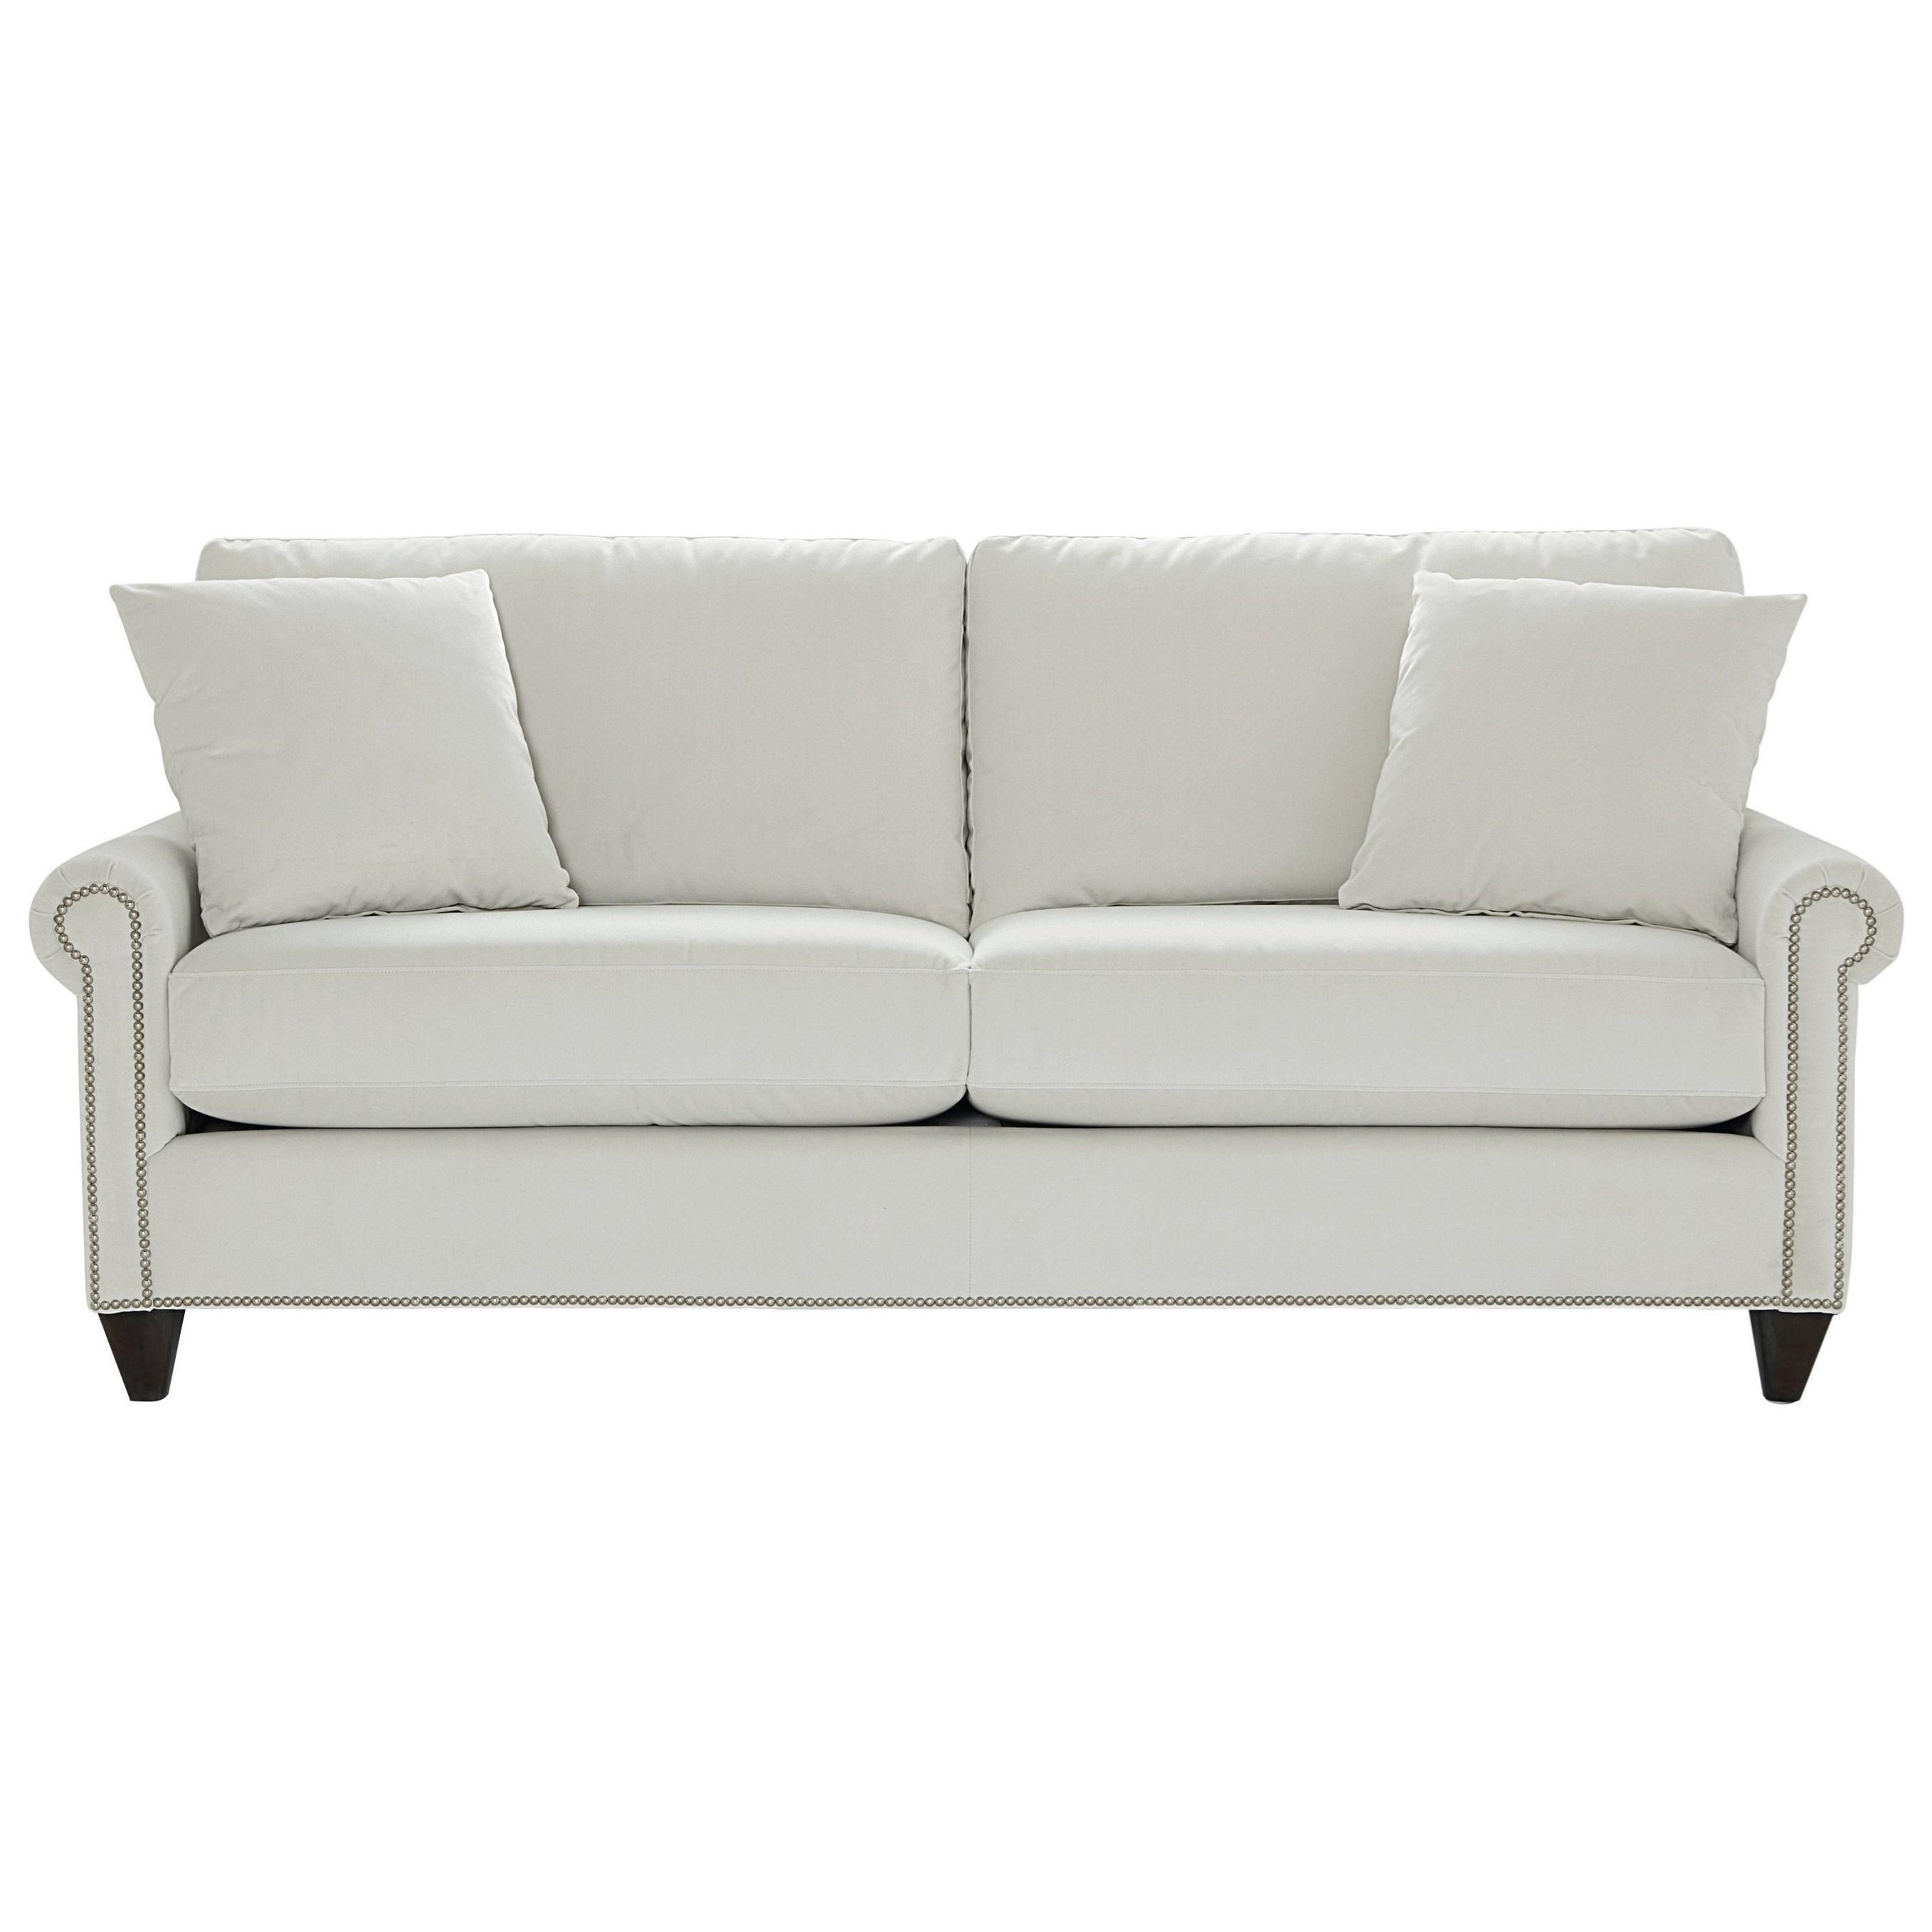 Custom Upholstery Customizable Classic Sofa by Bassett at Suburban Furniture